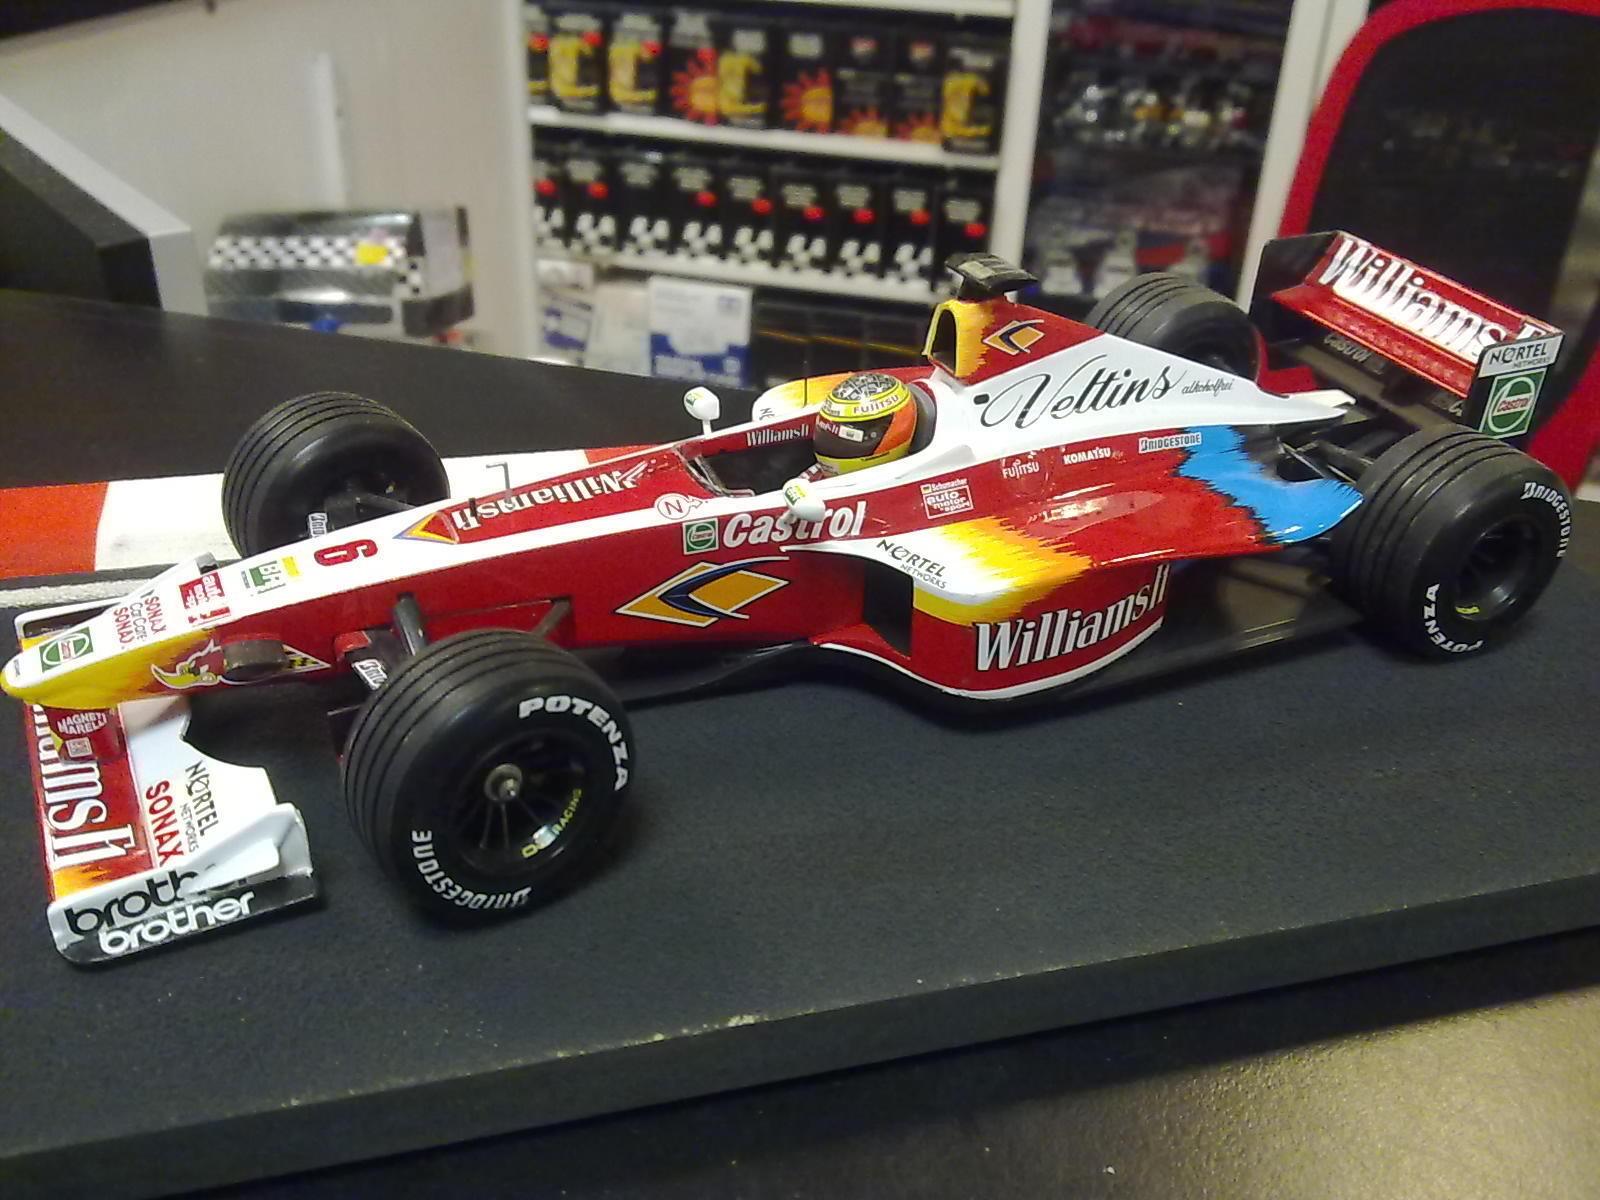 Williams  Supertec FW21 1999 1 18  6 Ralf Schumacher  grande remise